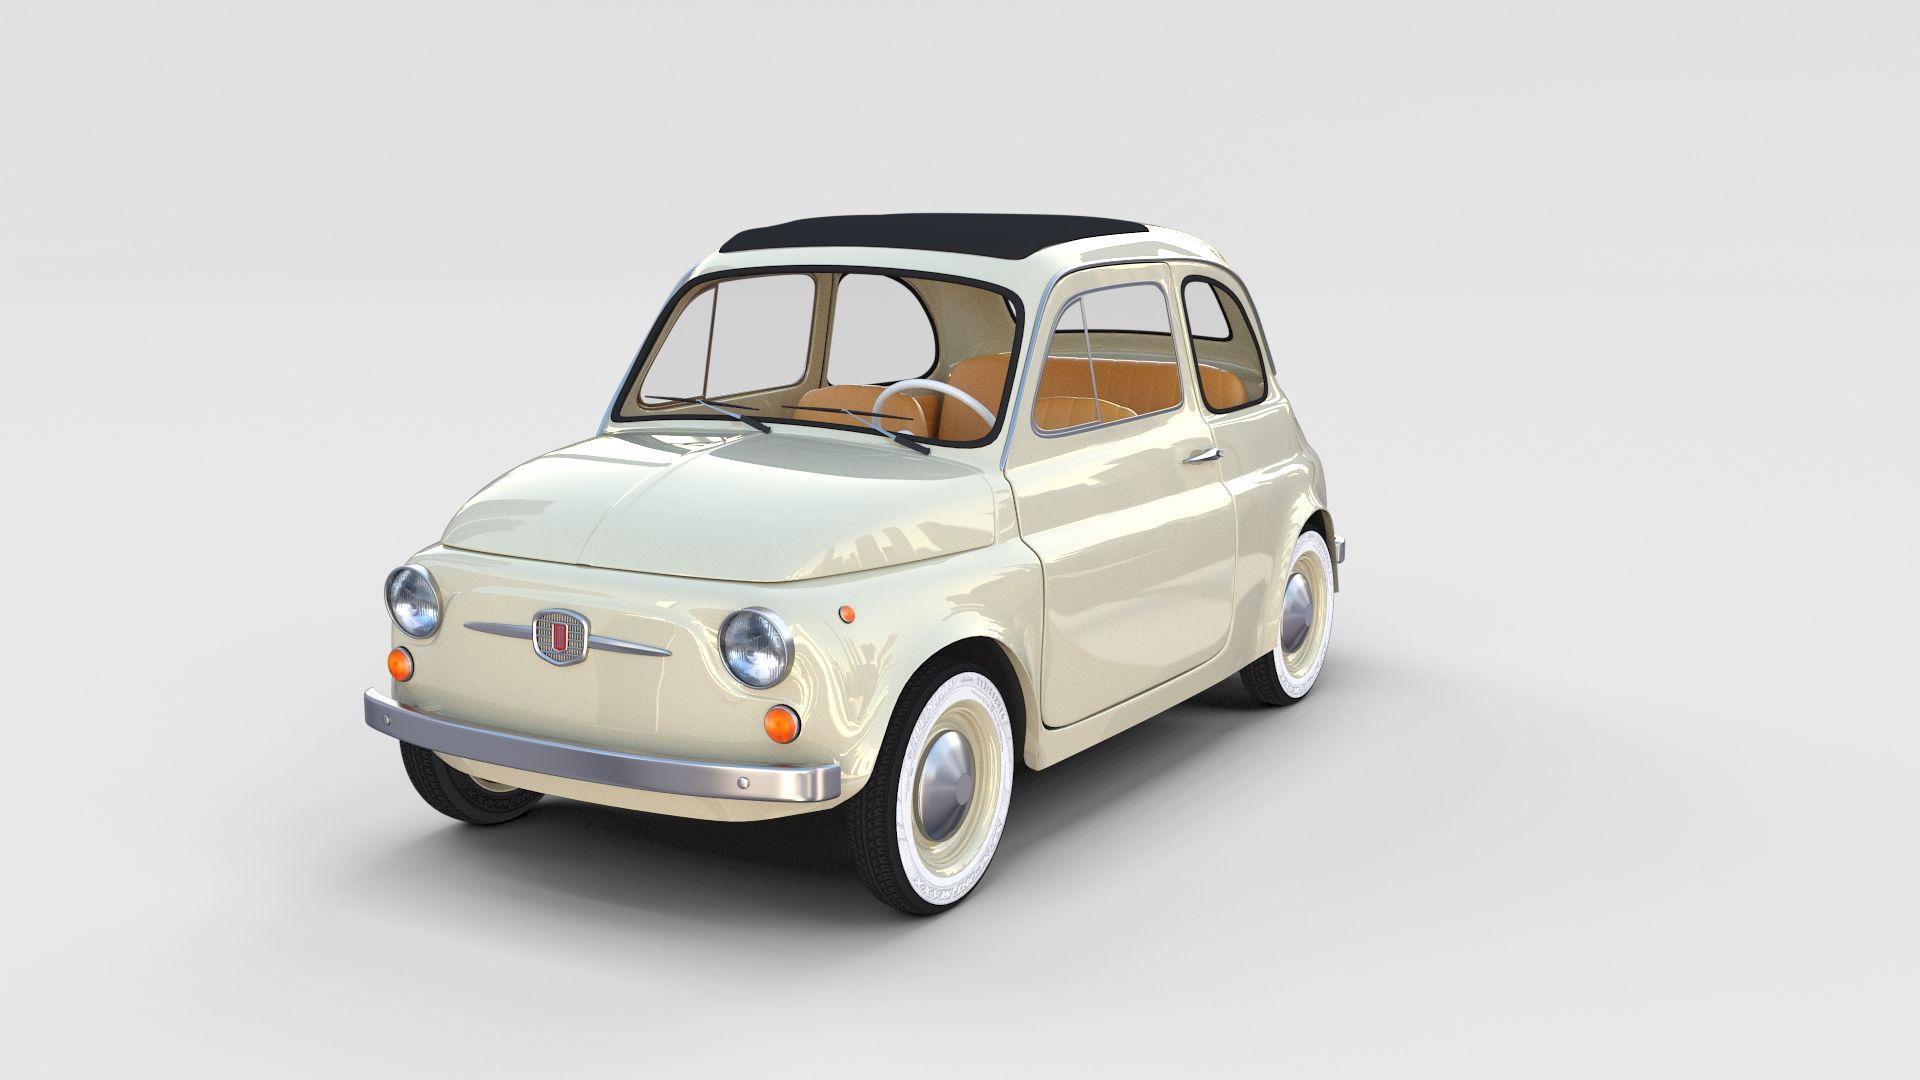 Fiat 500 With Interior Pack Fiat Pack Interior Fiat 500